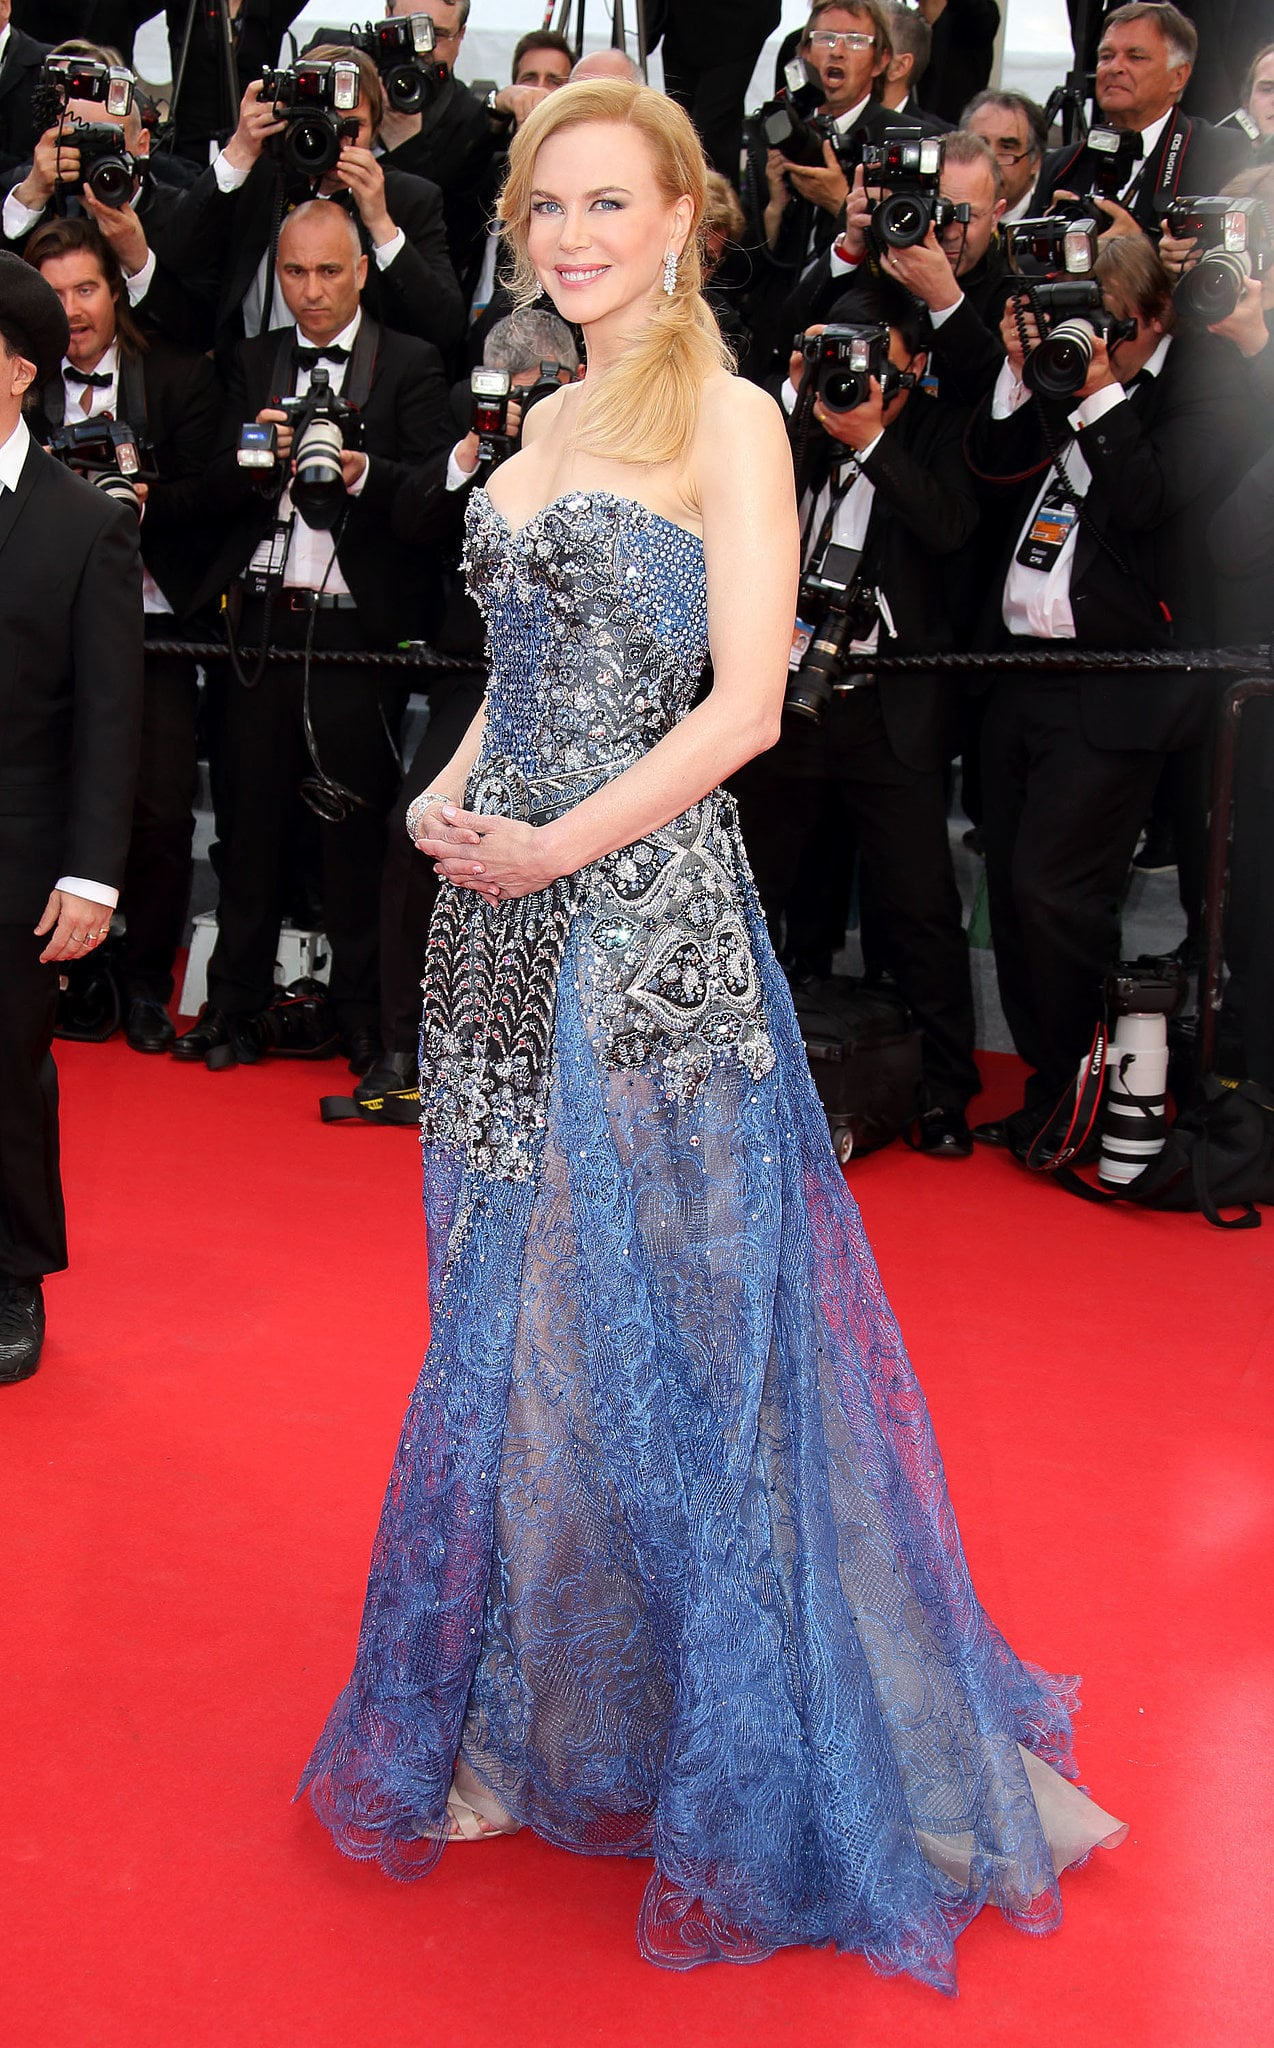 Nicole Kidman: Five Feet, 11 Inches